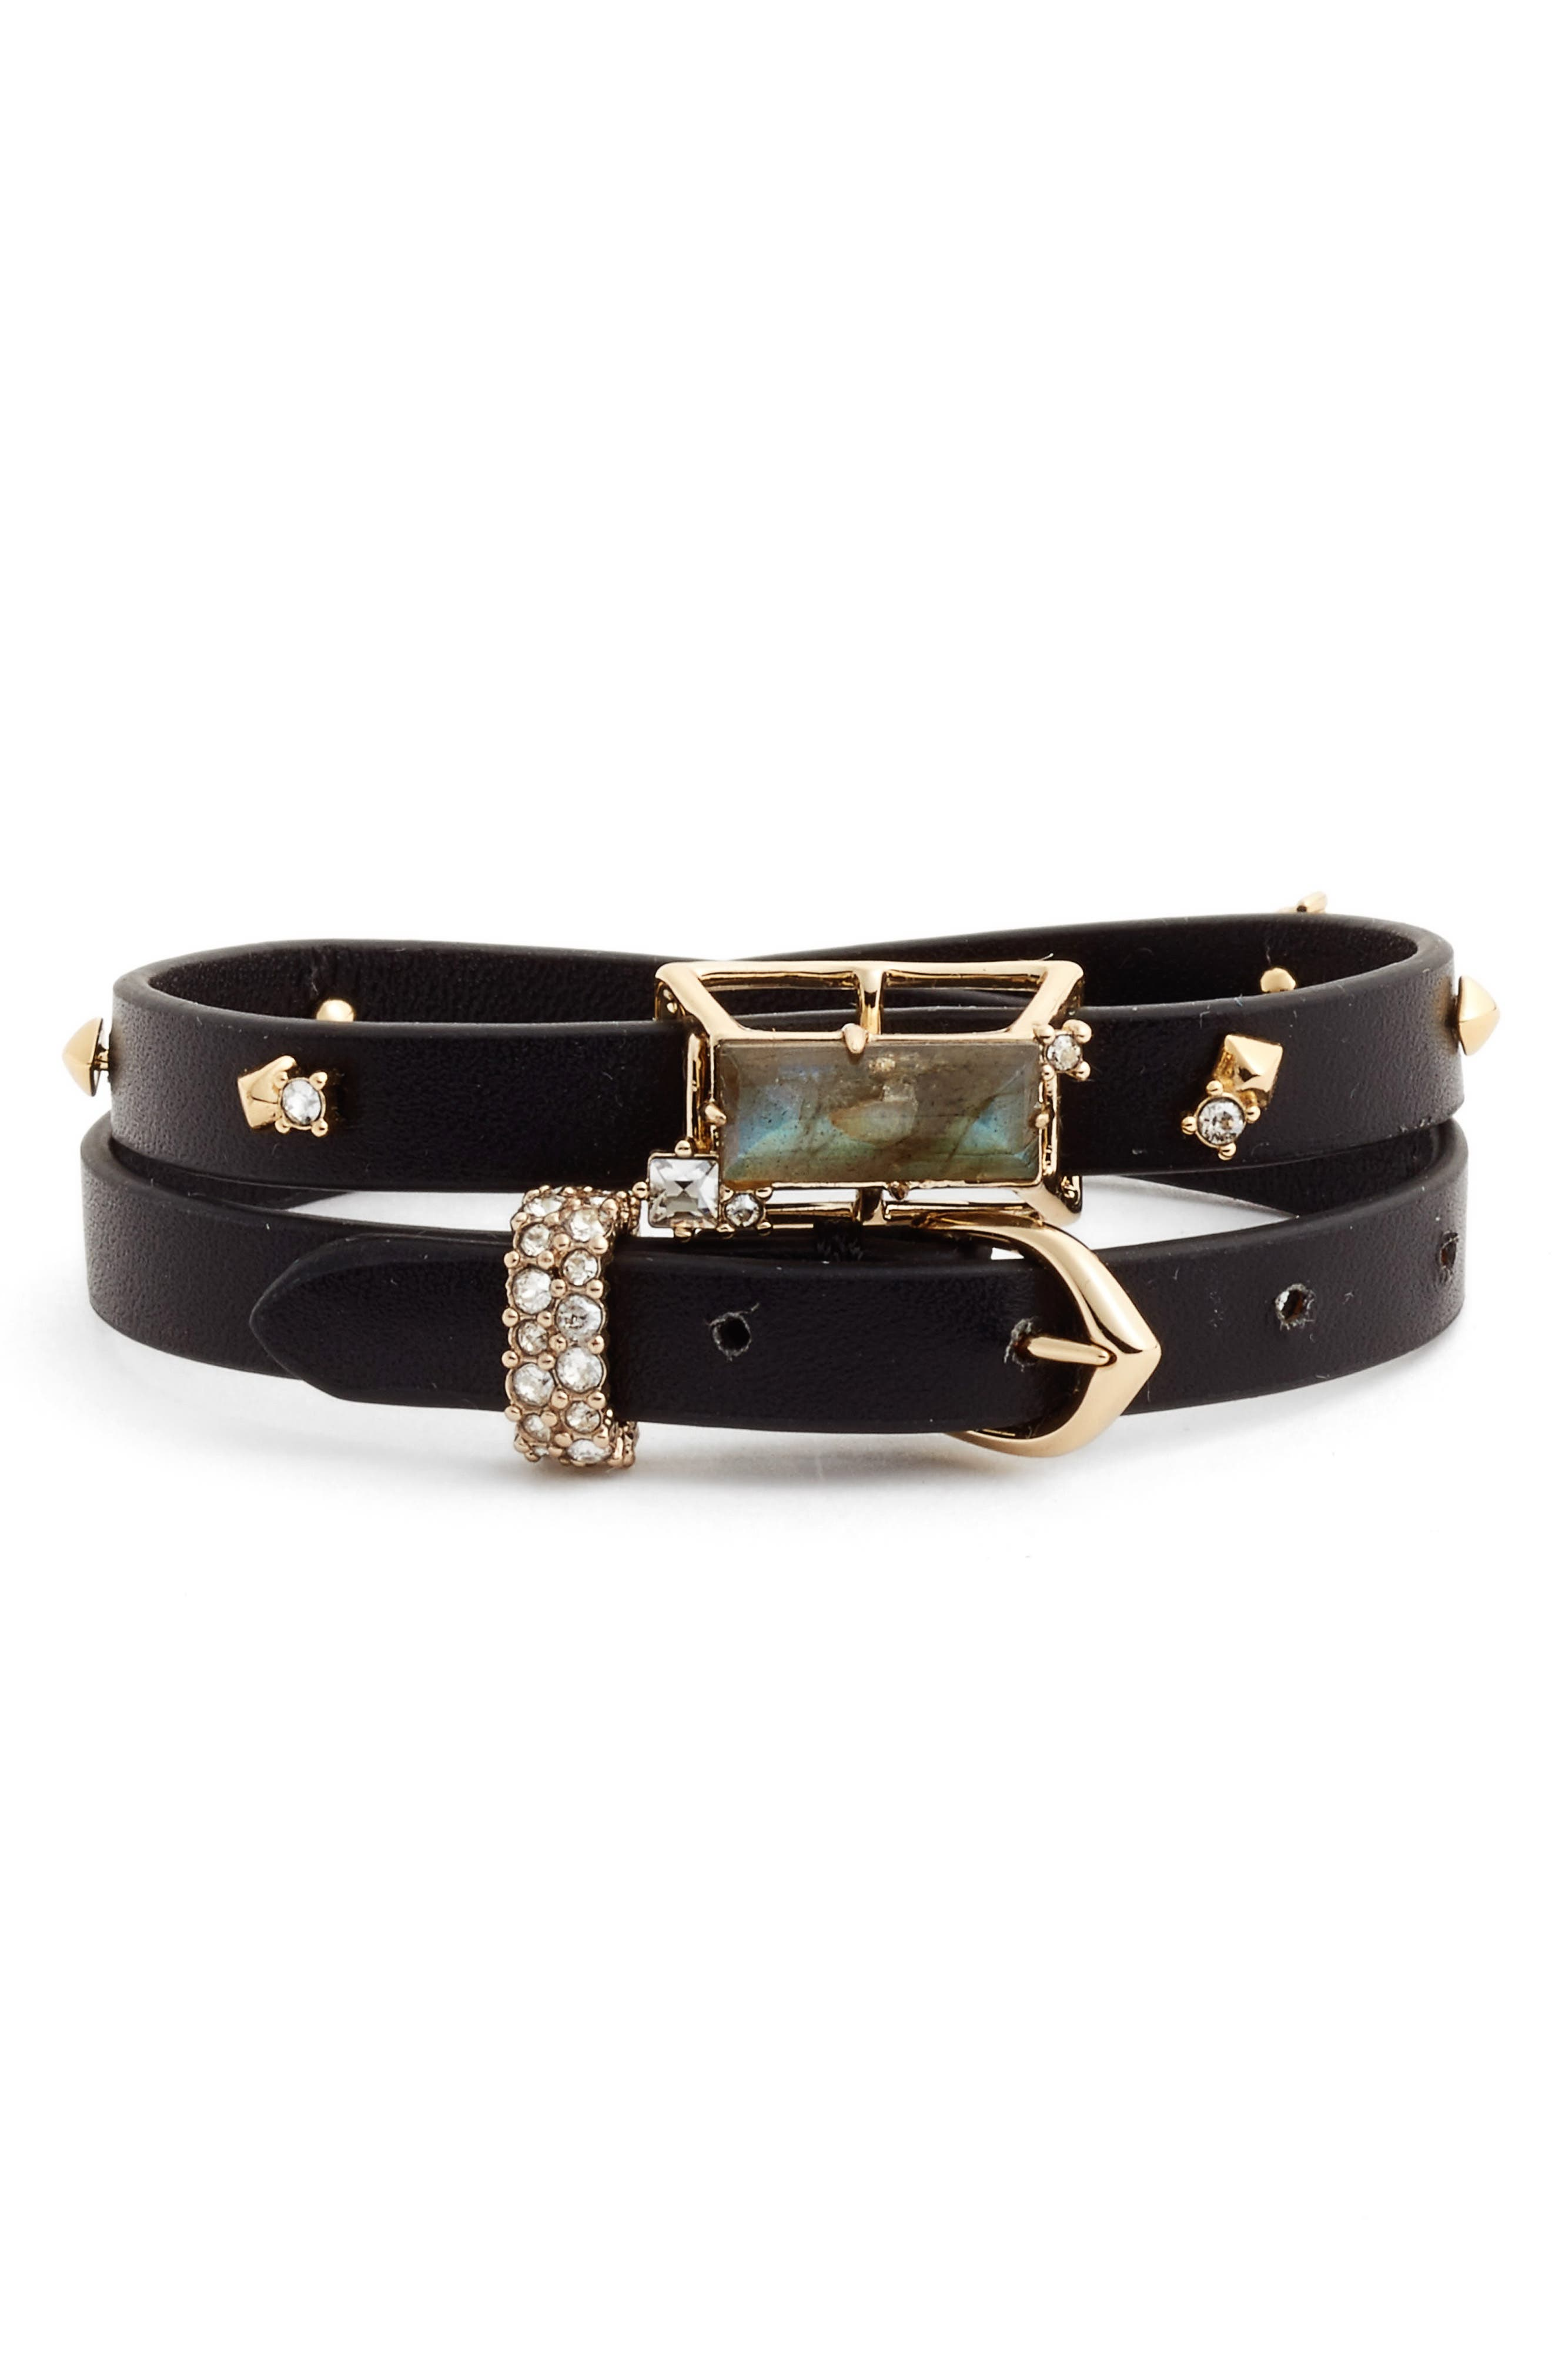 ALEXIS BITTAR Geo Leather Wrap Bracelet & Choker